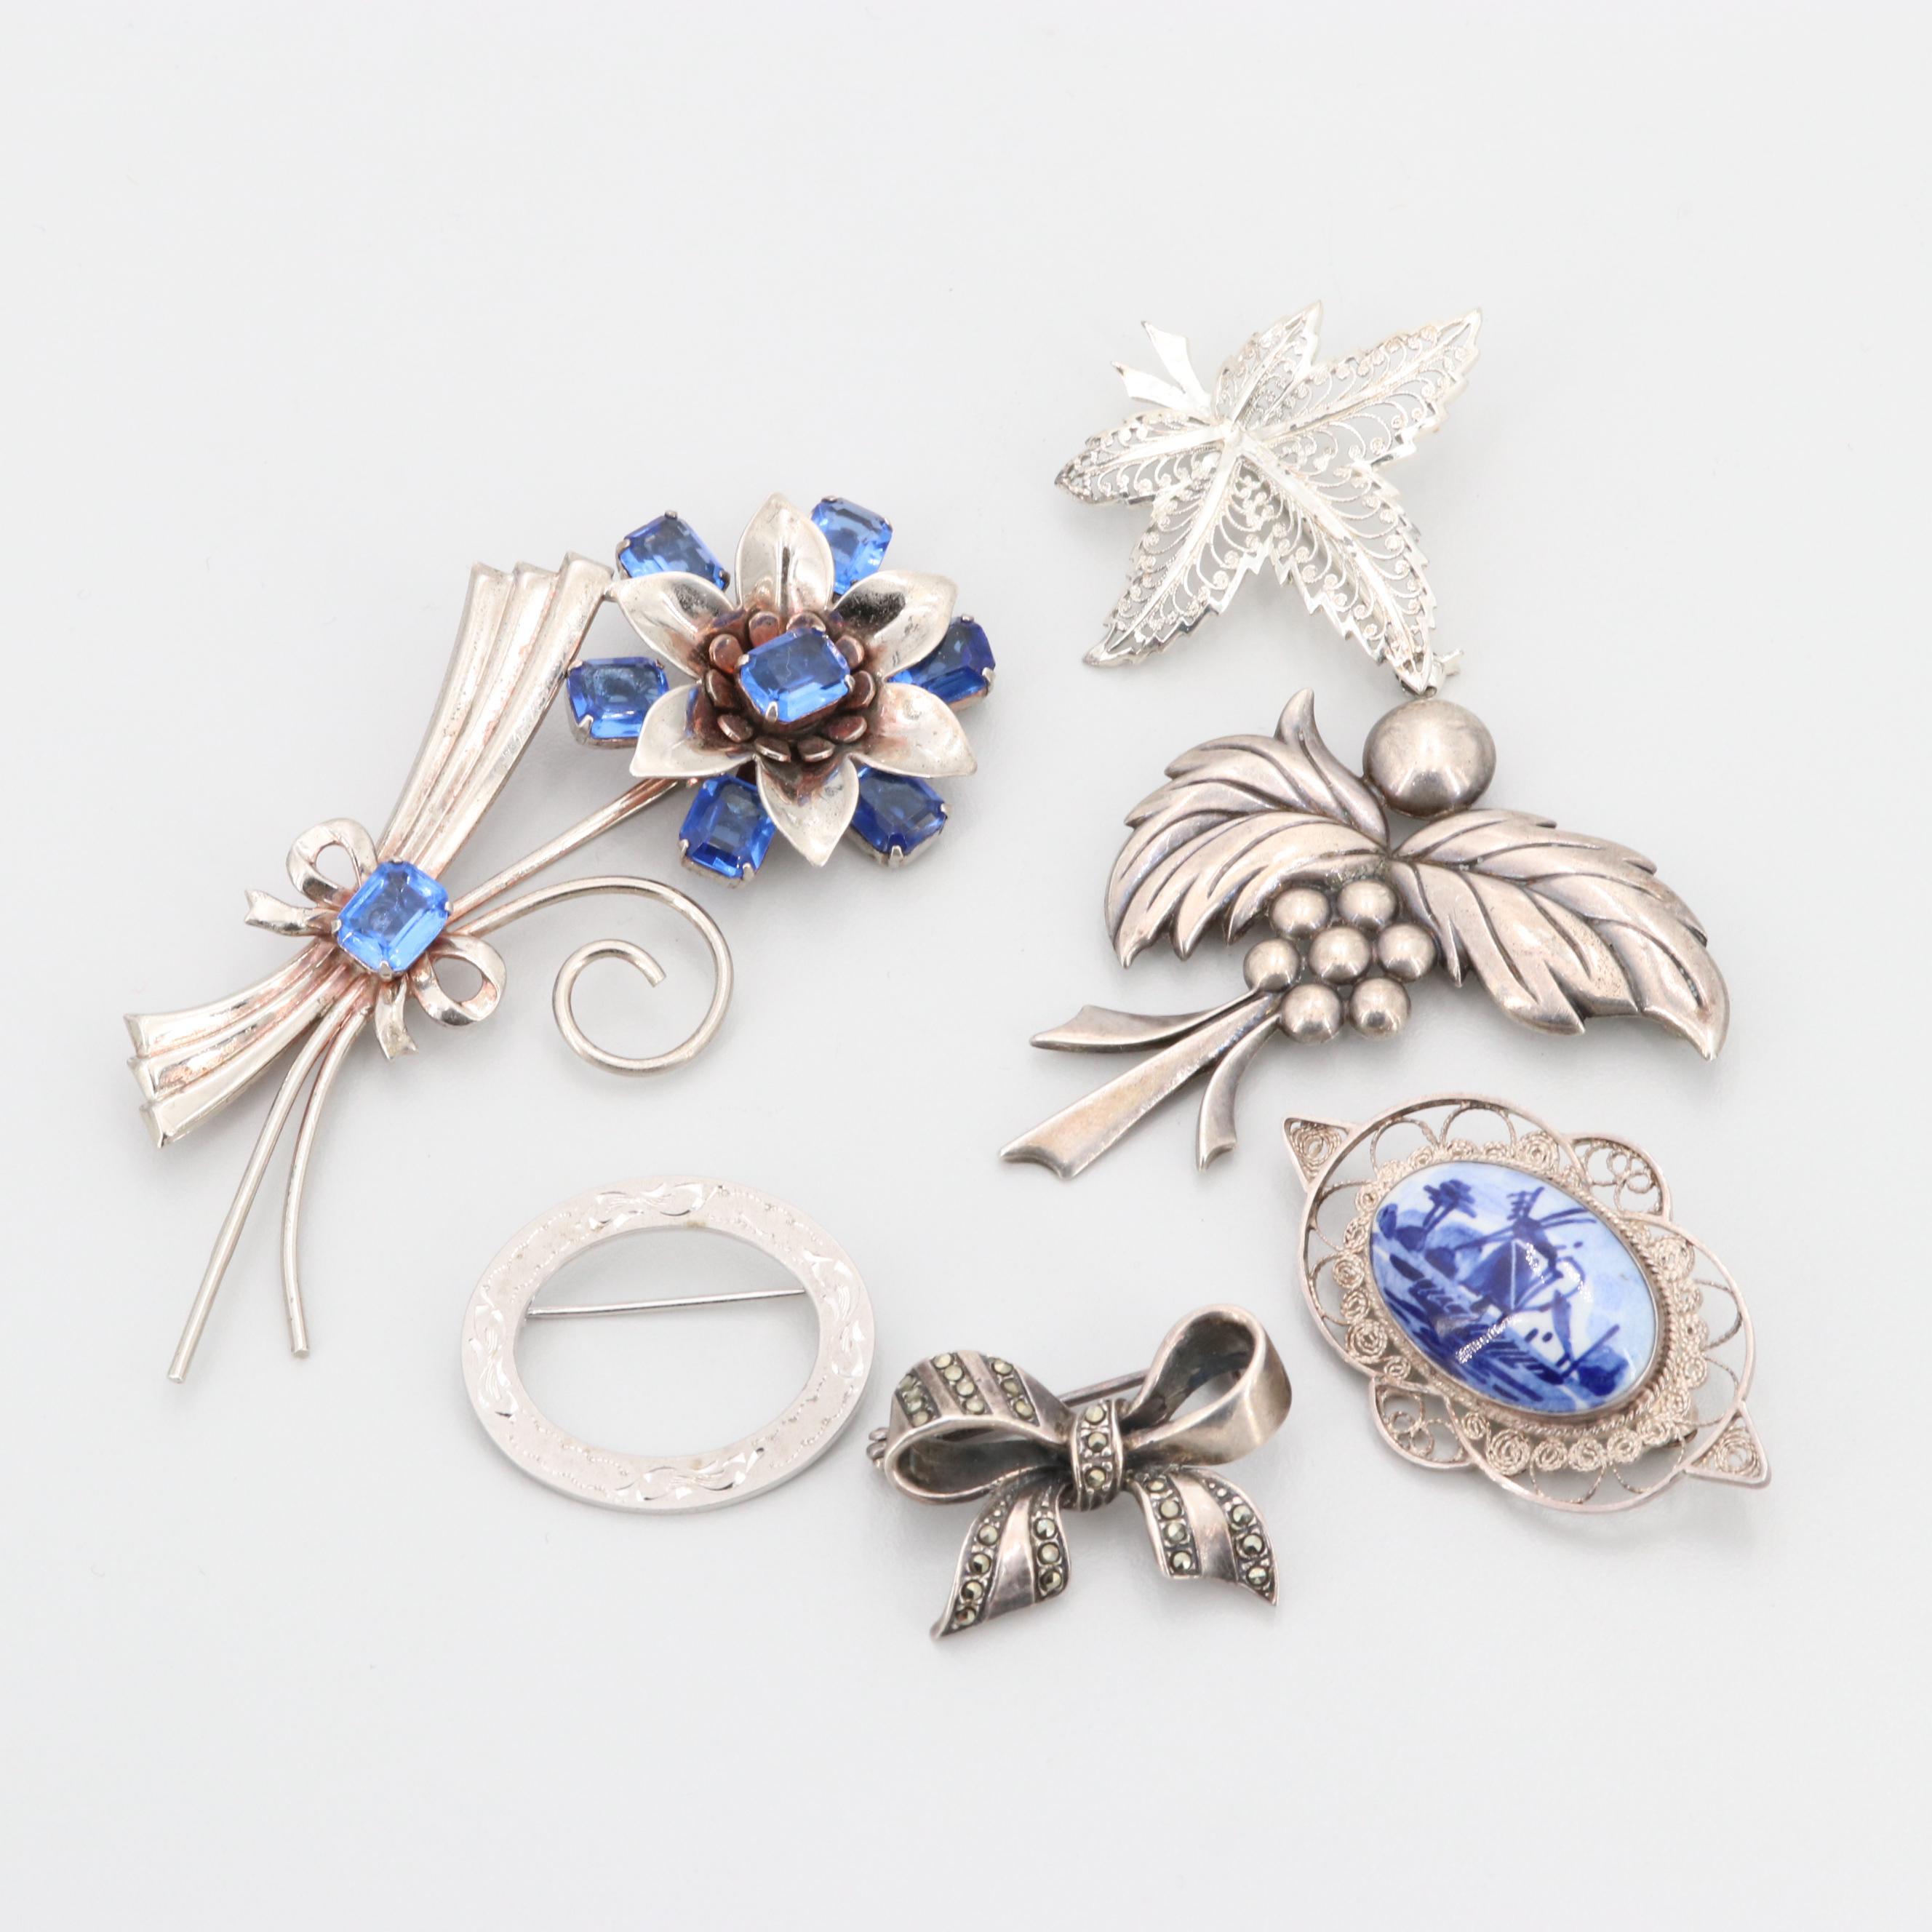 Delft Silver 3 Piece Set